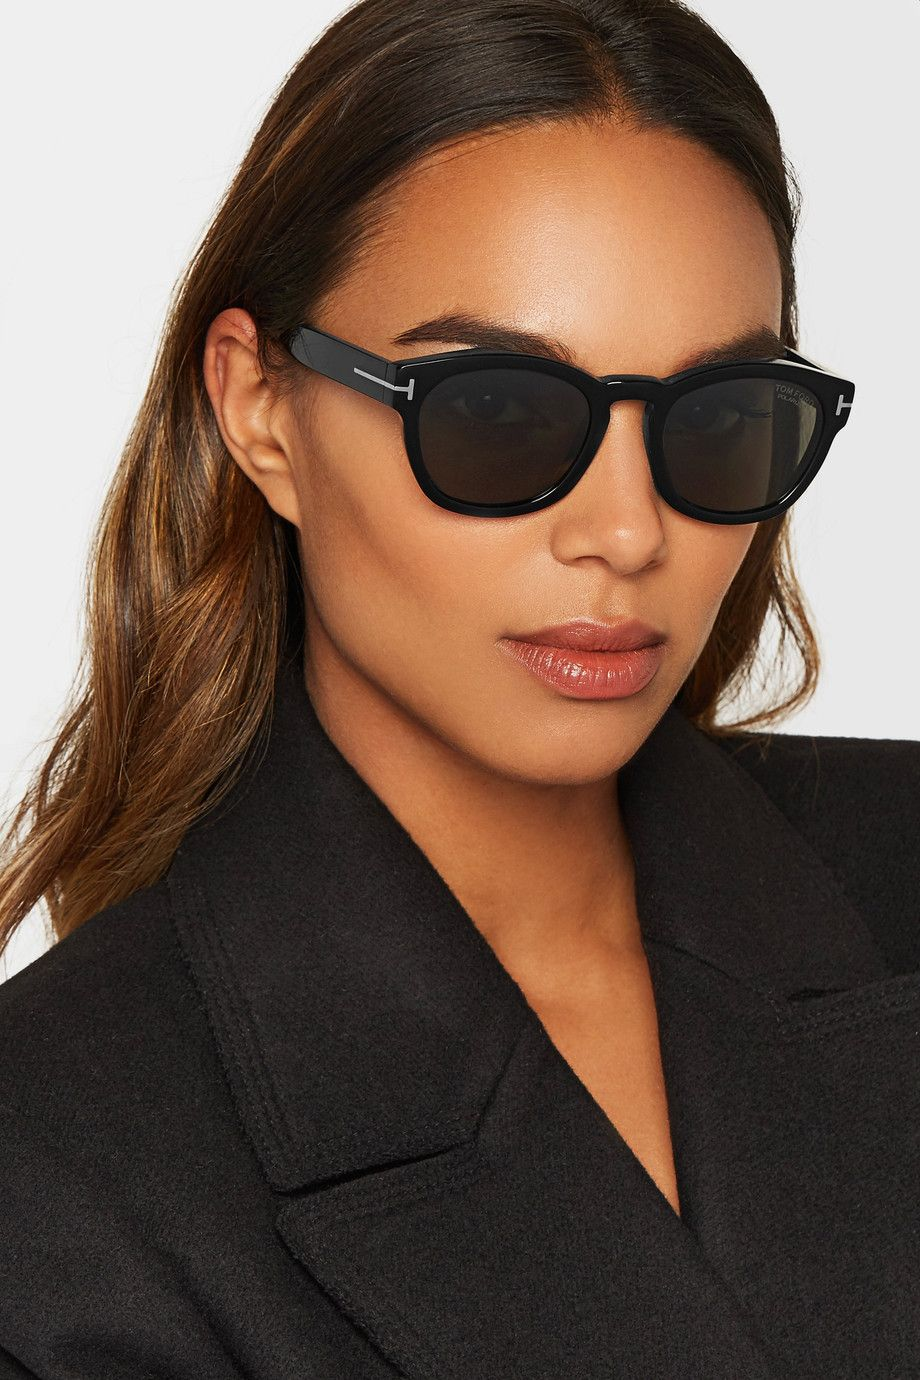 Cat-eye Gold-tone Mirrored Sunglasses - Blue Tom Ford xisiwx